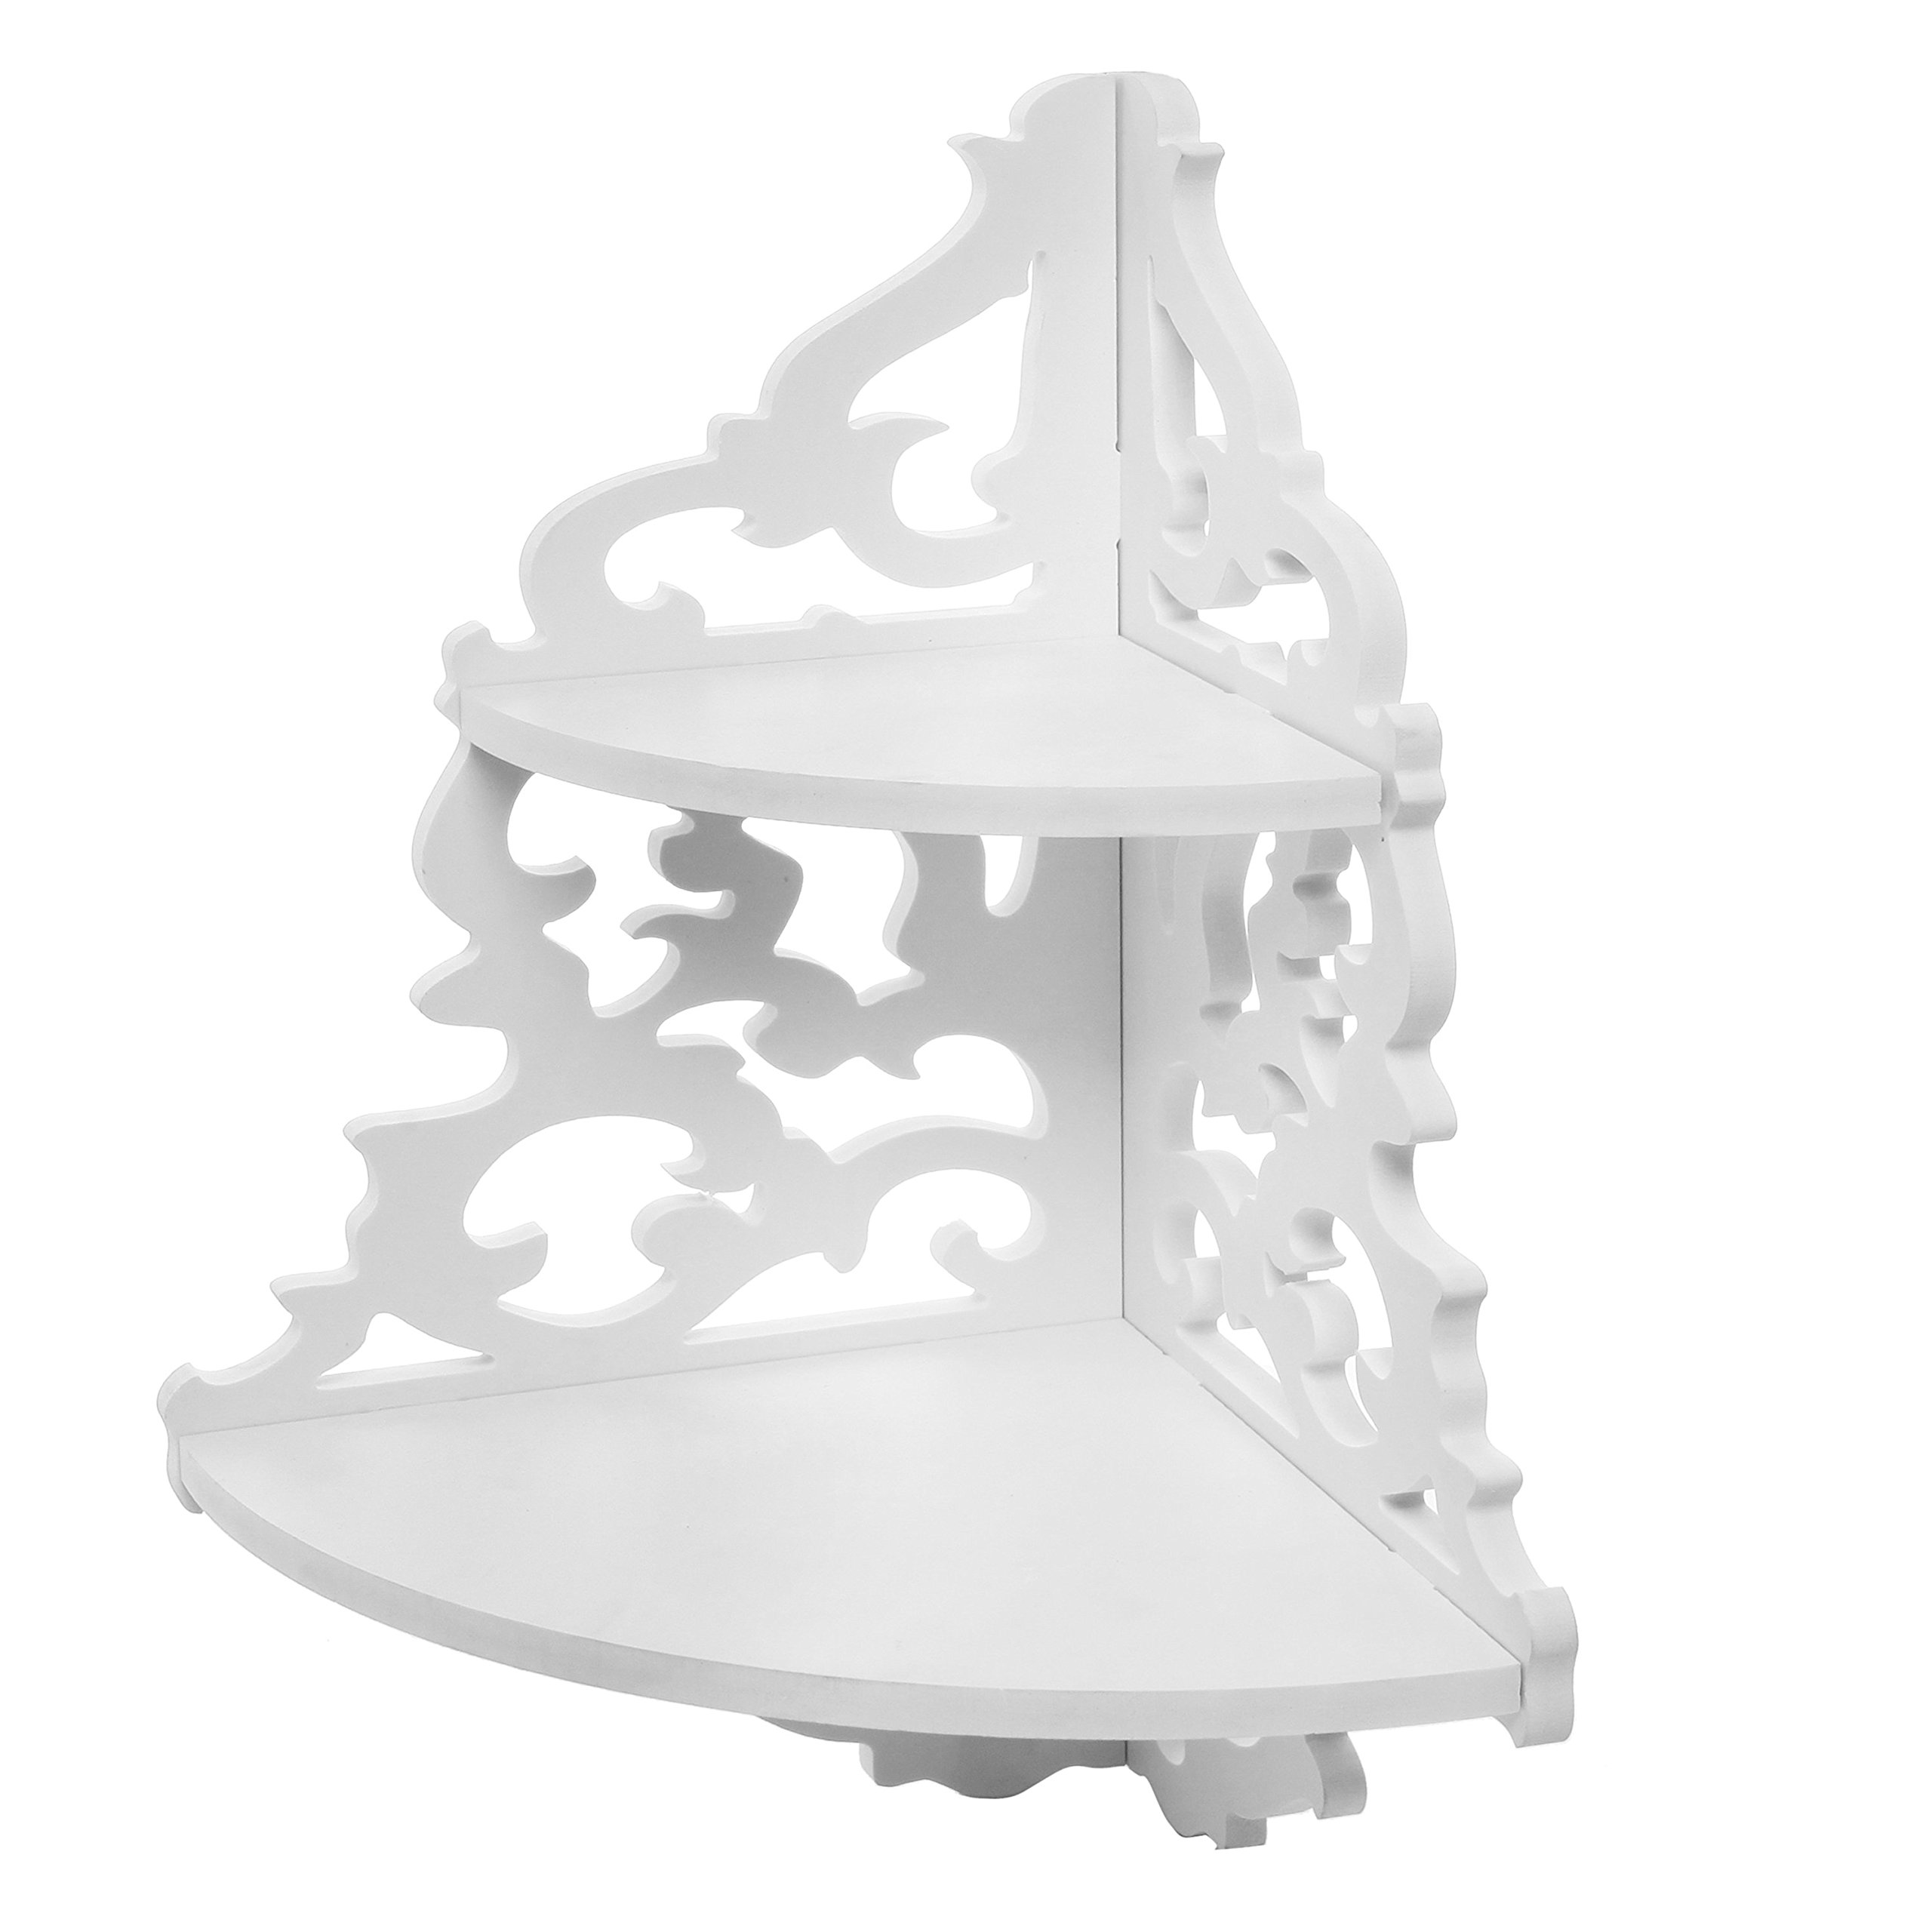 MyGift 2 Tier White Wall Mounted Pastoral Carved Floating Corner Shelf/Plant & Decor Display Rack